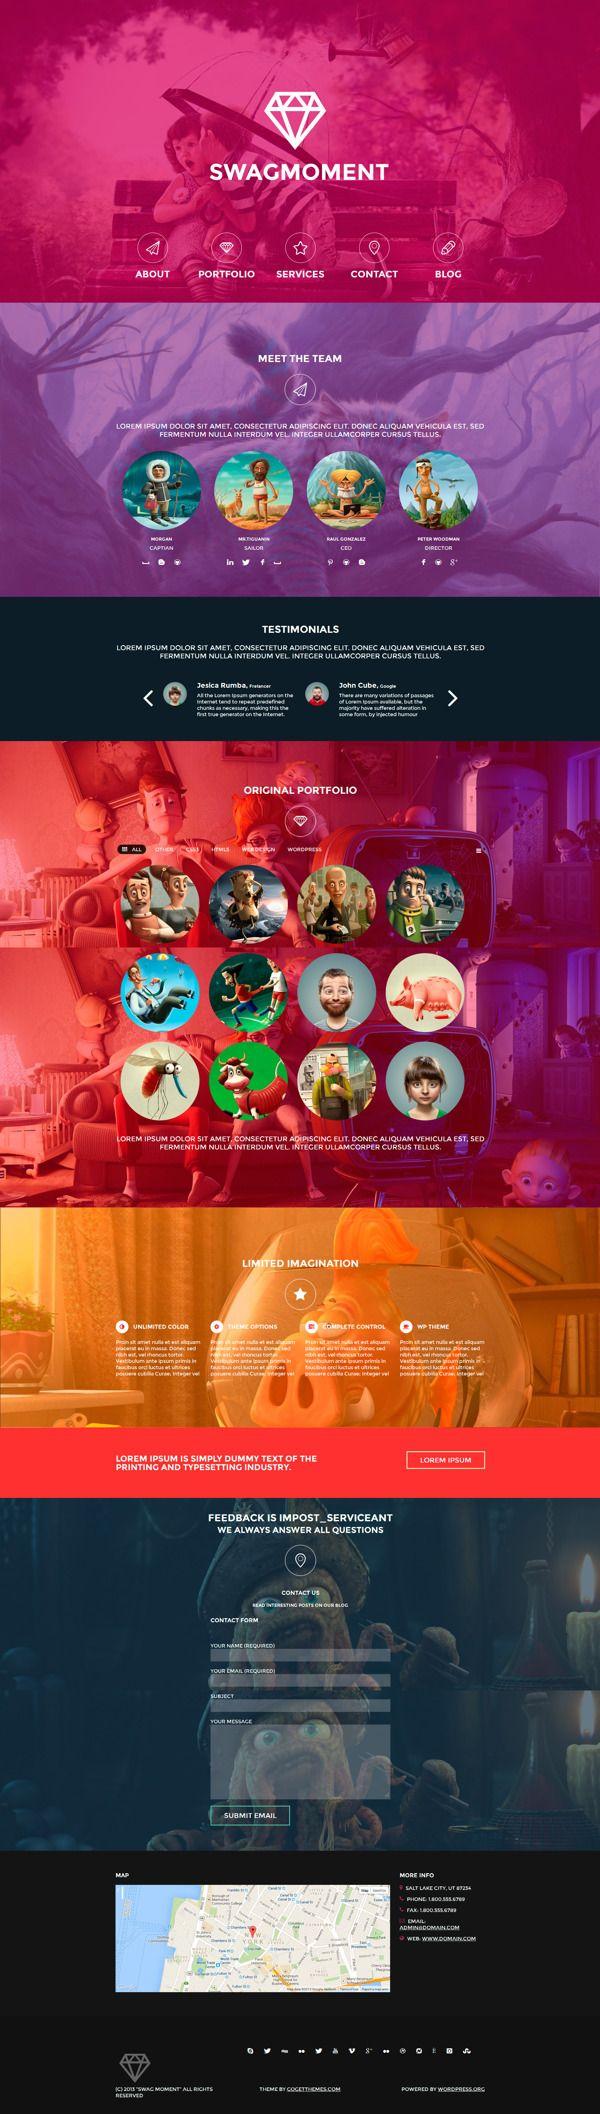 SwagMoment WordPress Theme by WordPress Awards, via Behance